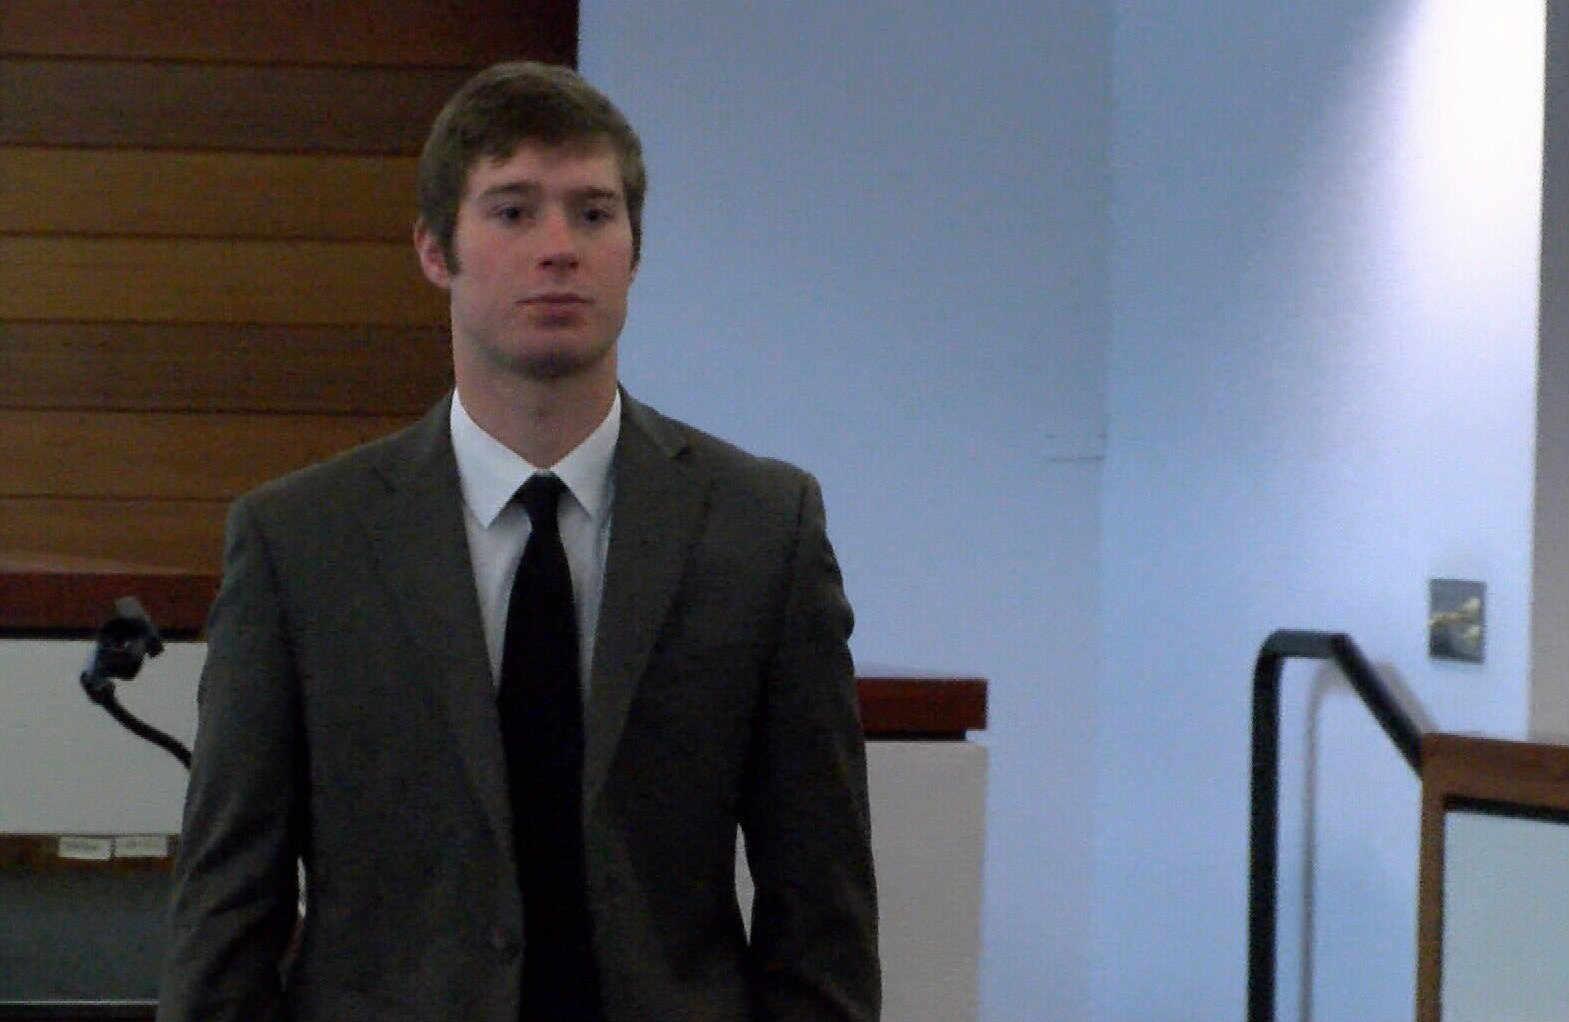 Prosecutors say her boyfriend, Geoffrey Qualls, provided Dietrich with the drug.